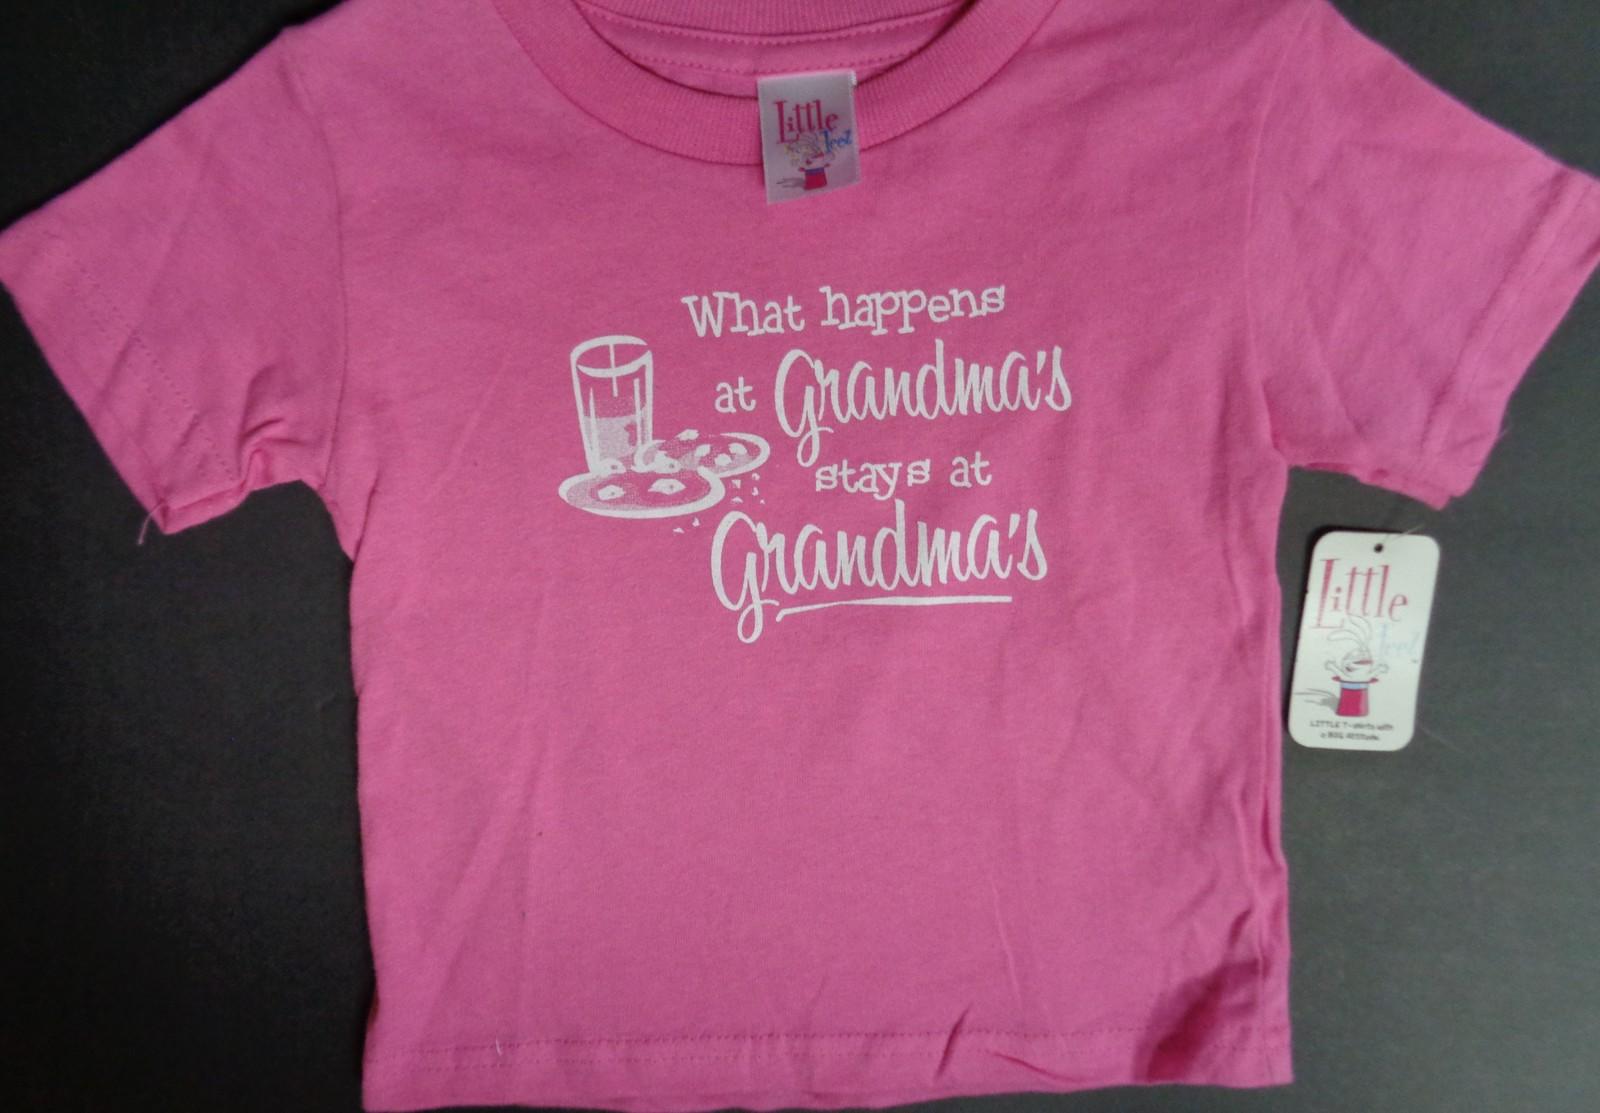 WHAT HAPPENS AT GRANDMA'S STAYS AT GRANDMA'S Toddler T-Shirt NWT Sz 2T